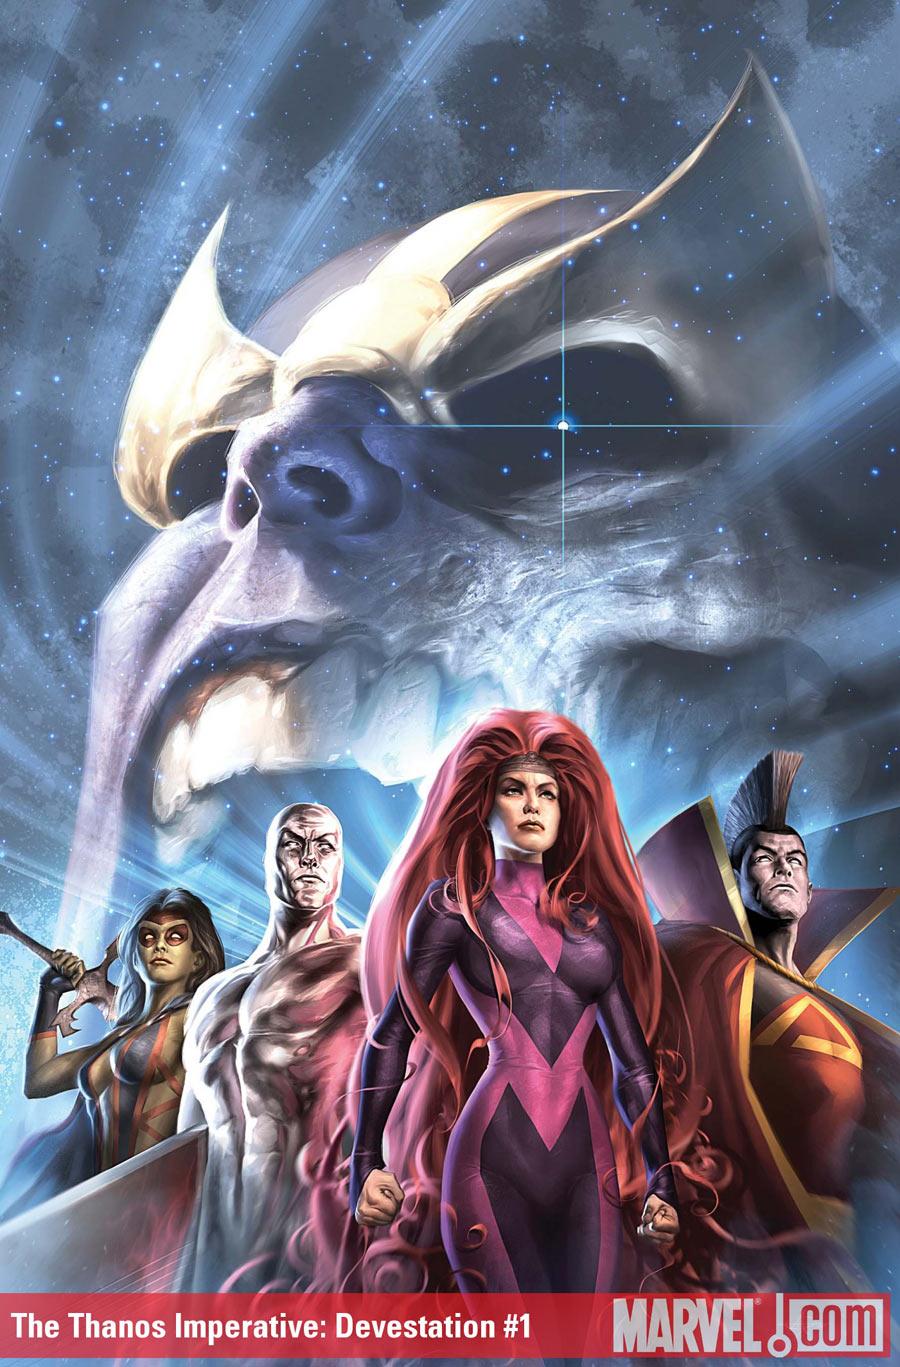 108_The_Thanos_Imperative__Devestation_1